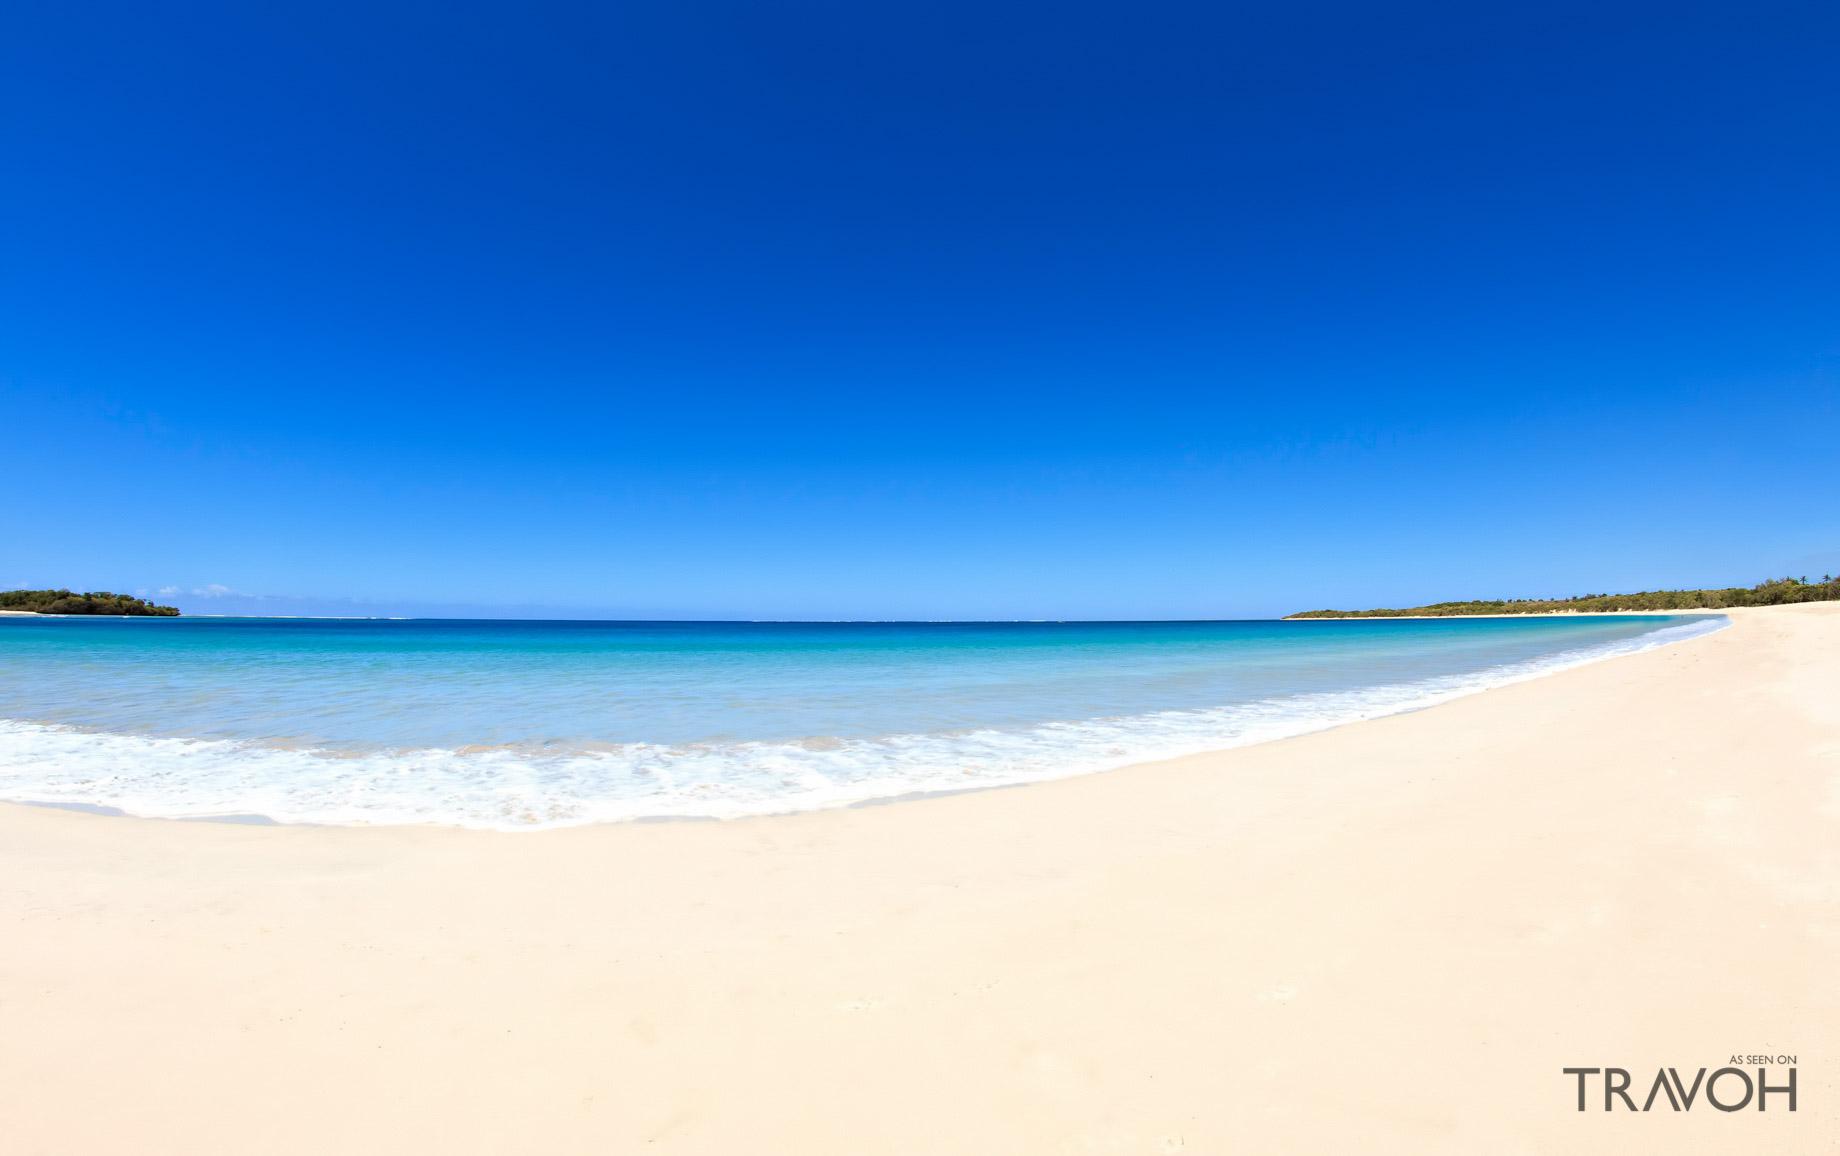 Natadola Beach Resort - Exploring 10 of the Top Beach Locations on the Islands of Fiji